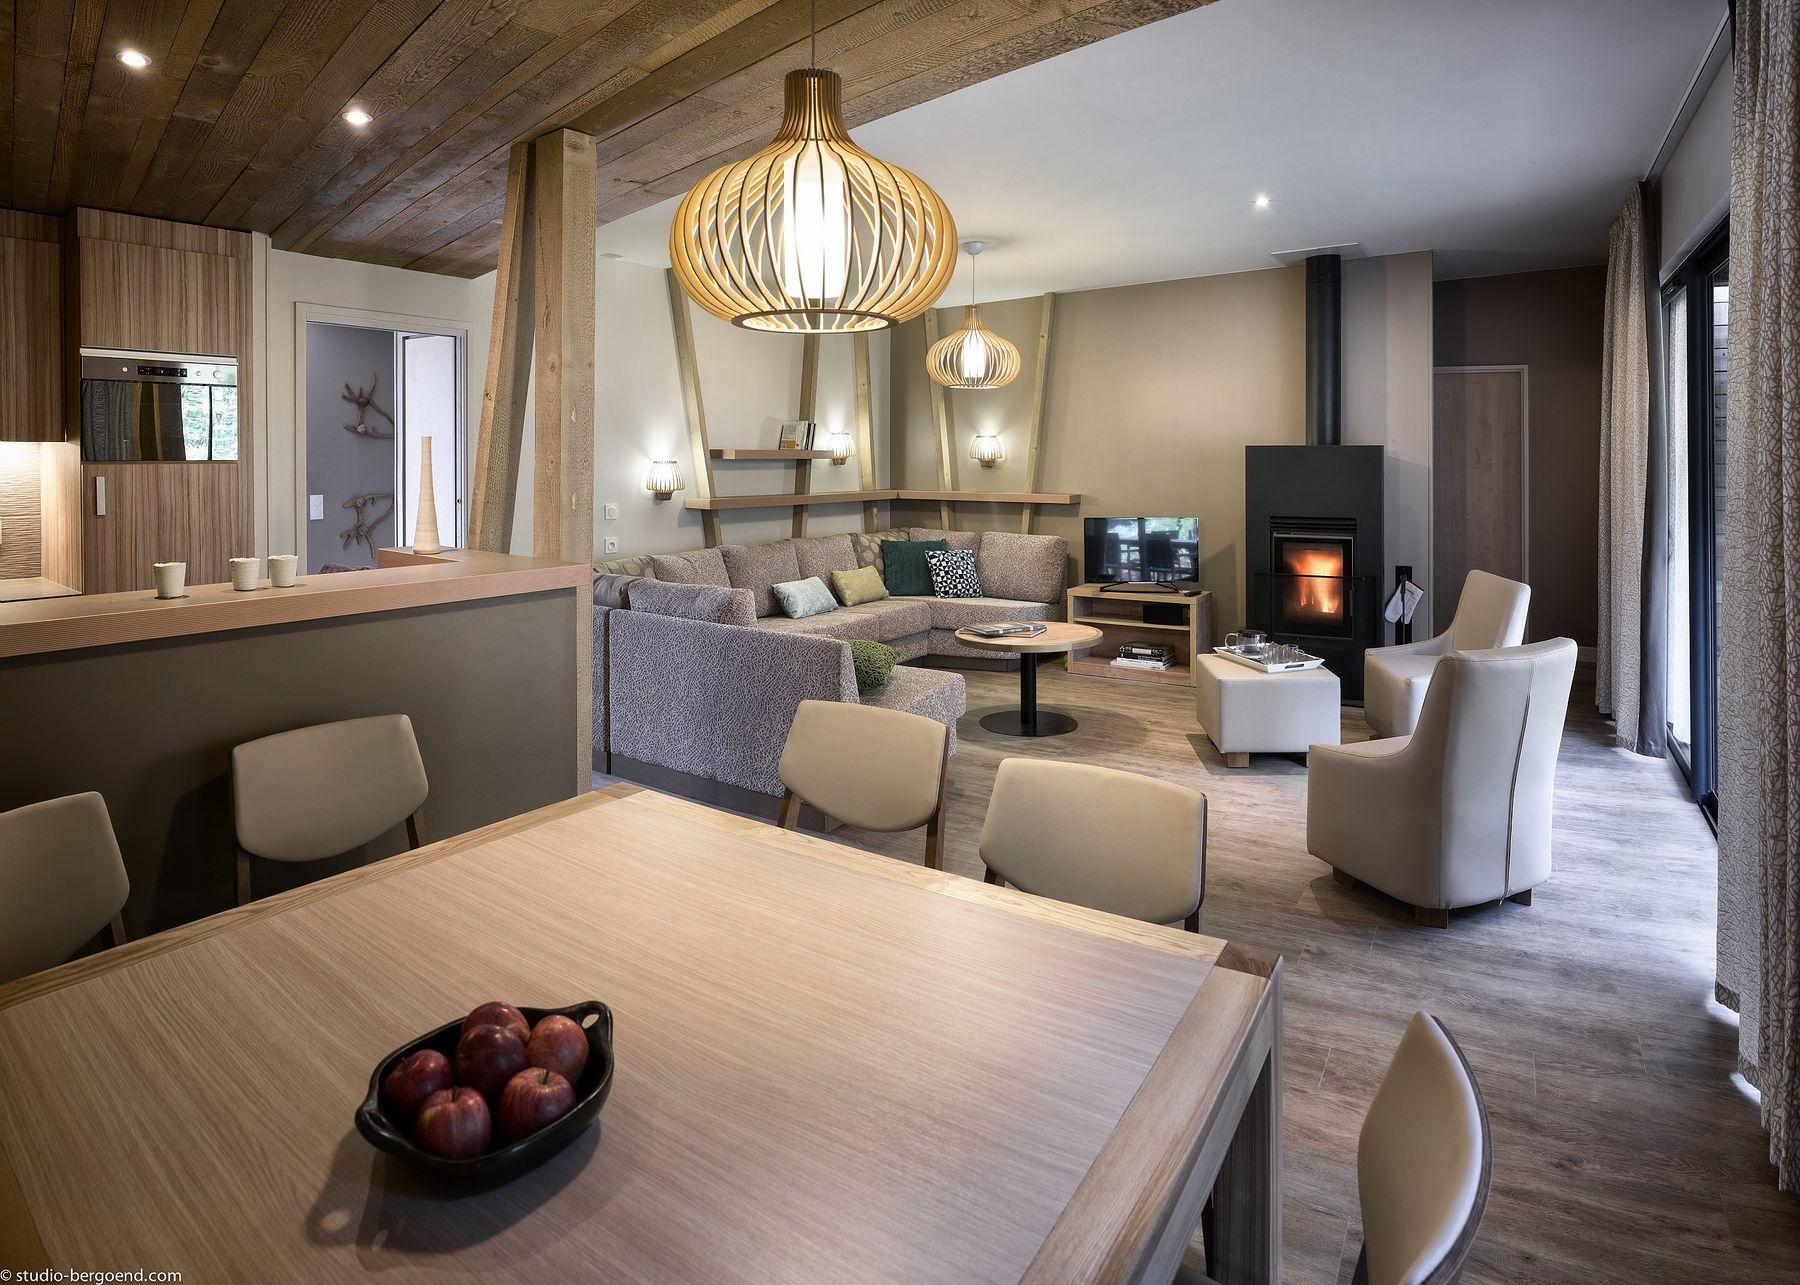 neue bilder ferienh user in le bois aux daims. Black Bedroom Furniture Sets. Home Design Ideas